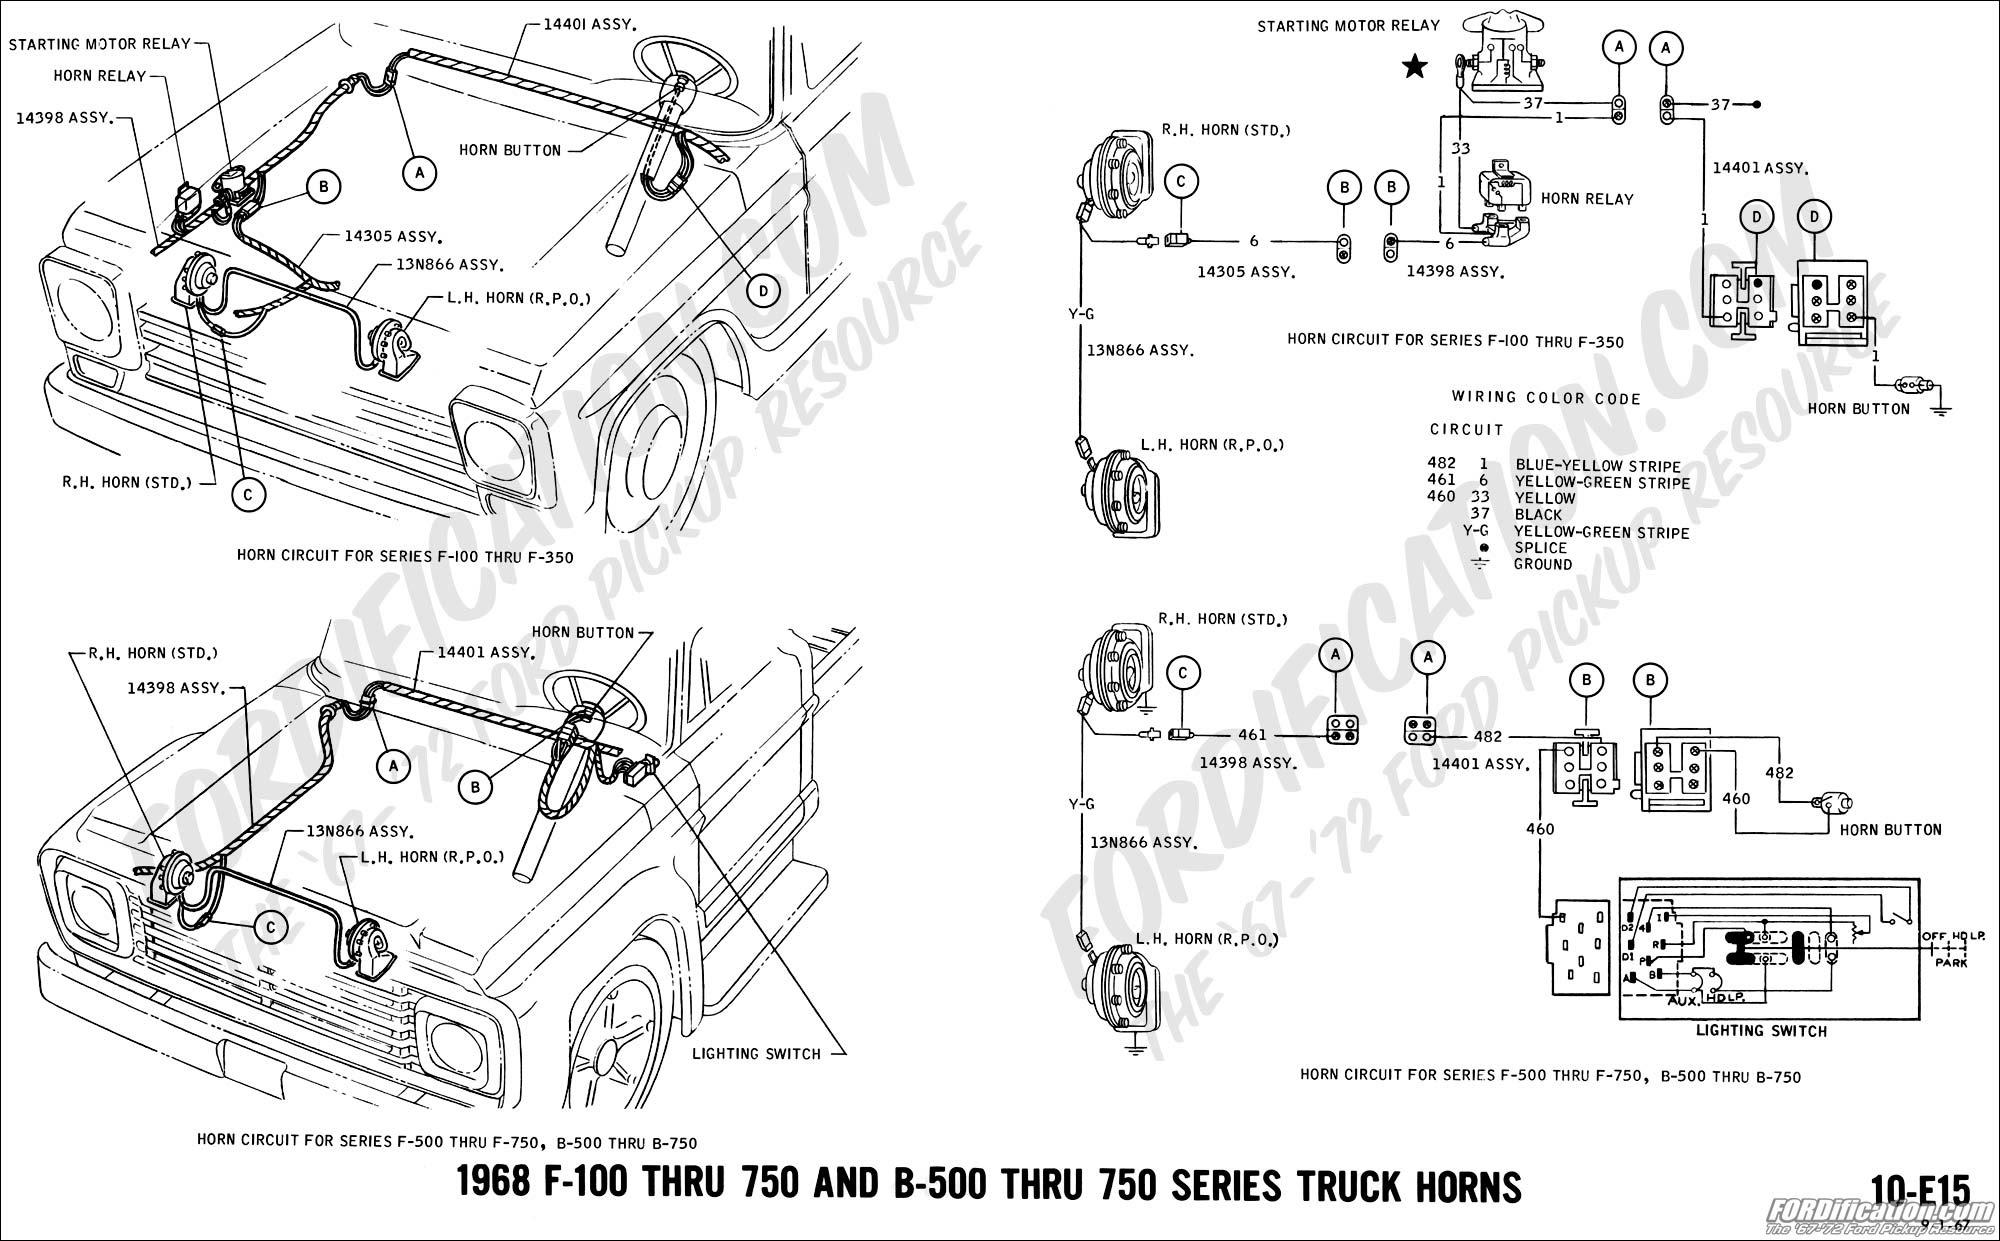 1967 Mustang Horn Wiring Diagram Ford F150 Headlight Wiring Diagram Cummis Bmw In E46 Jeanjaures37 Fr